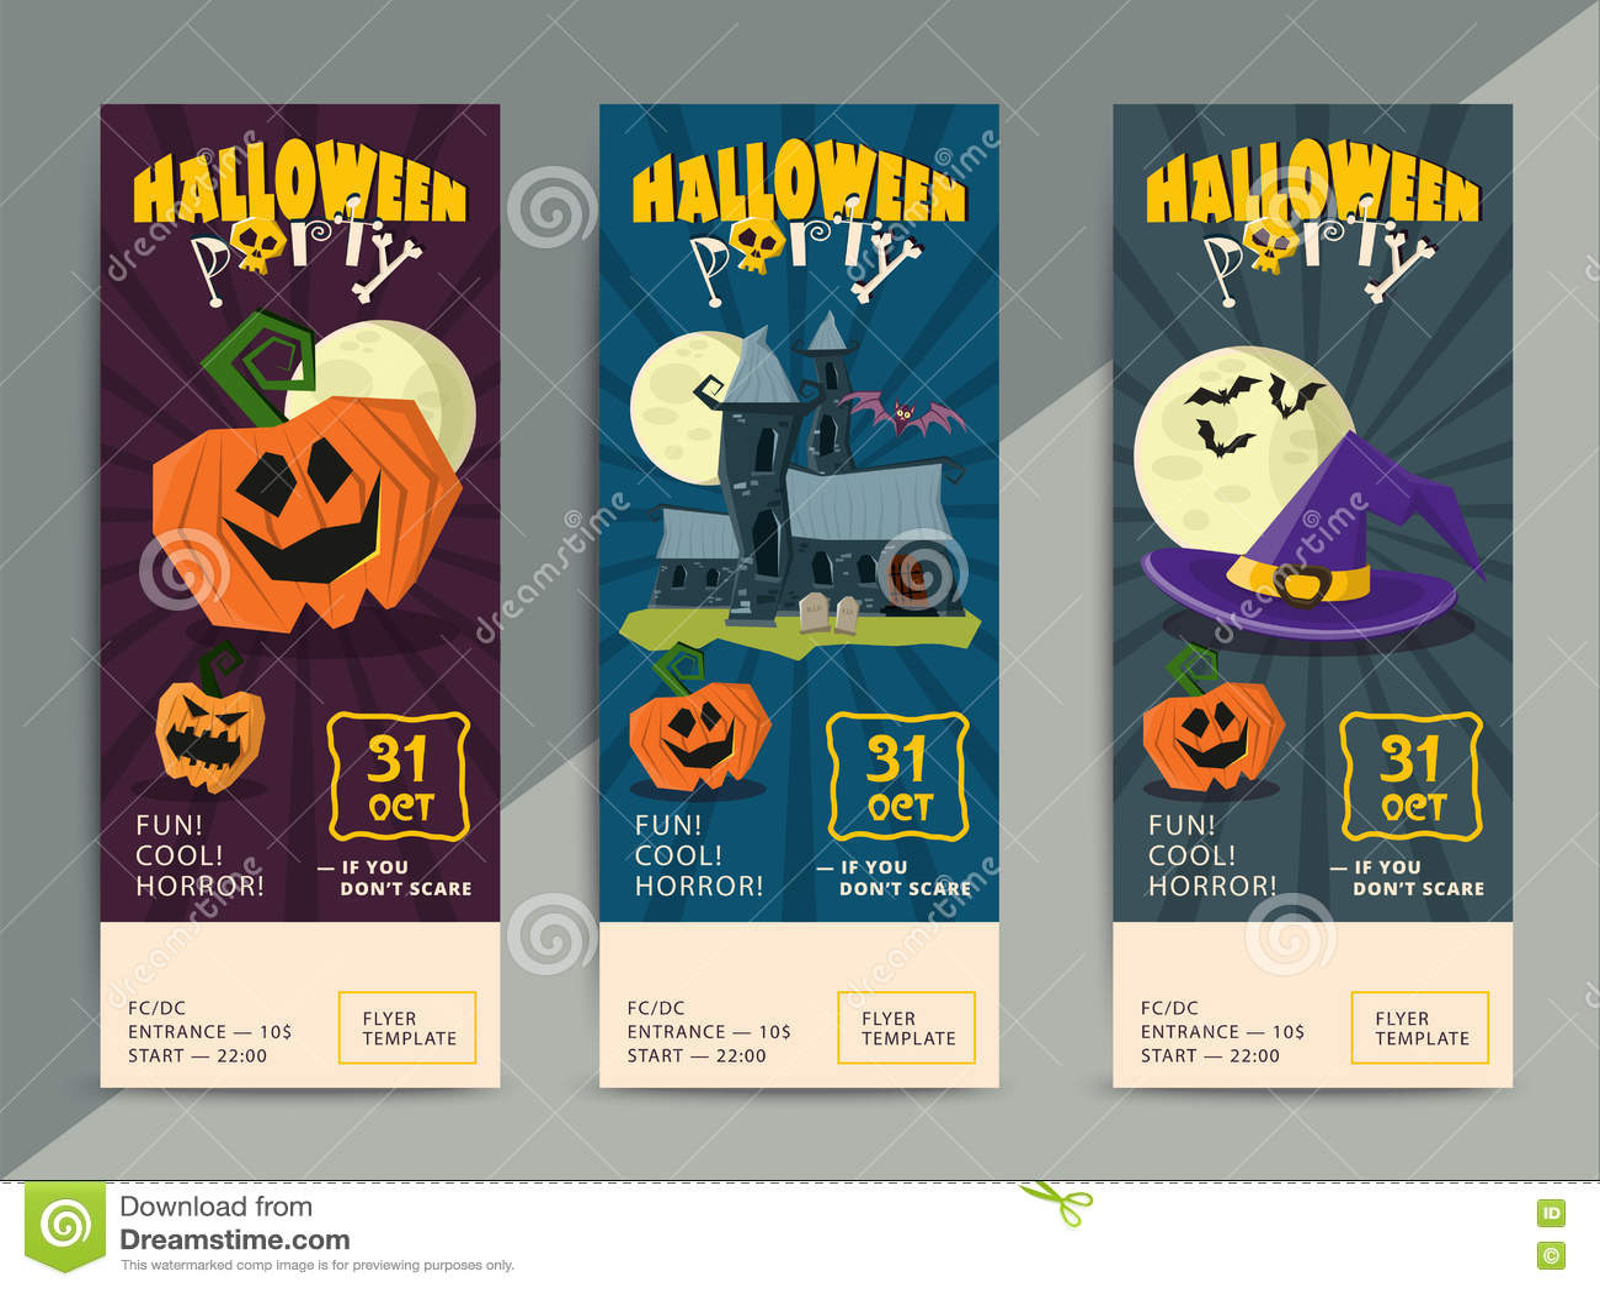 happy halloween party flyer template design stock vector image happy halloween party flyer template design